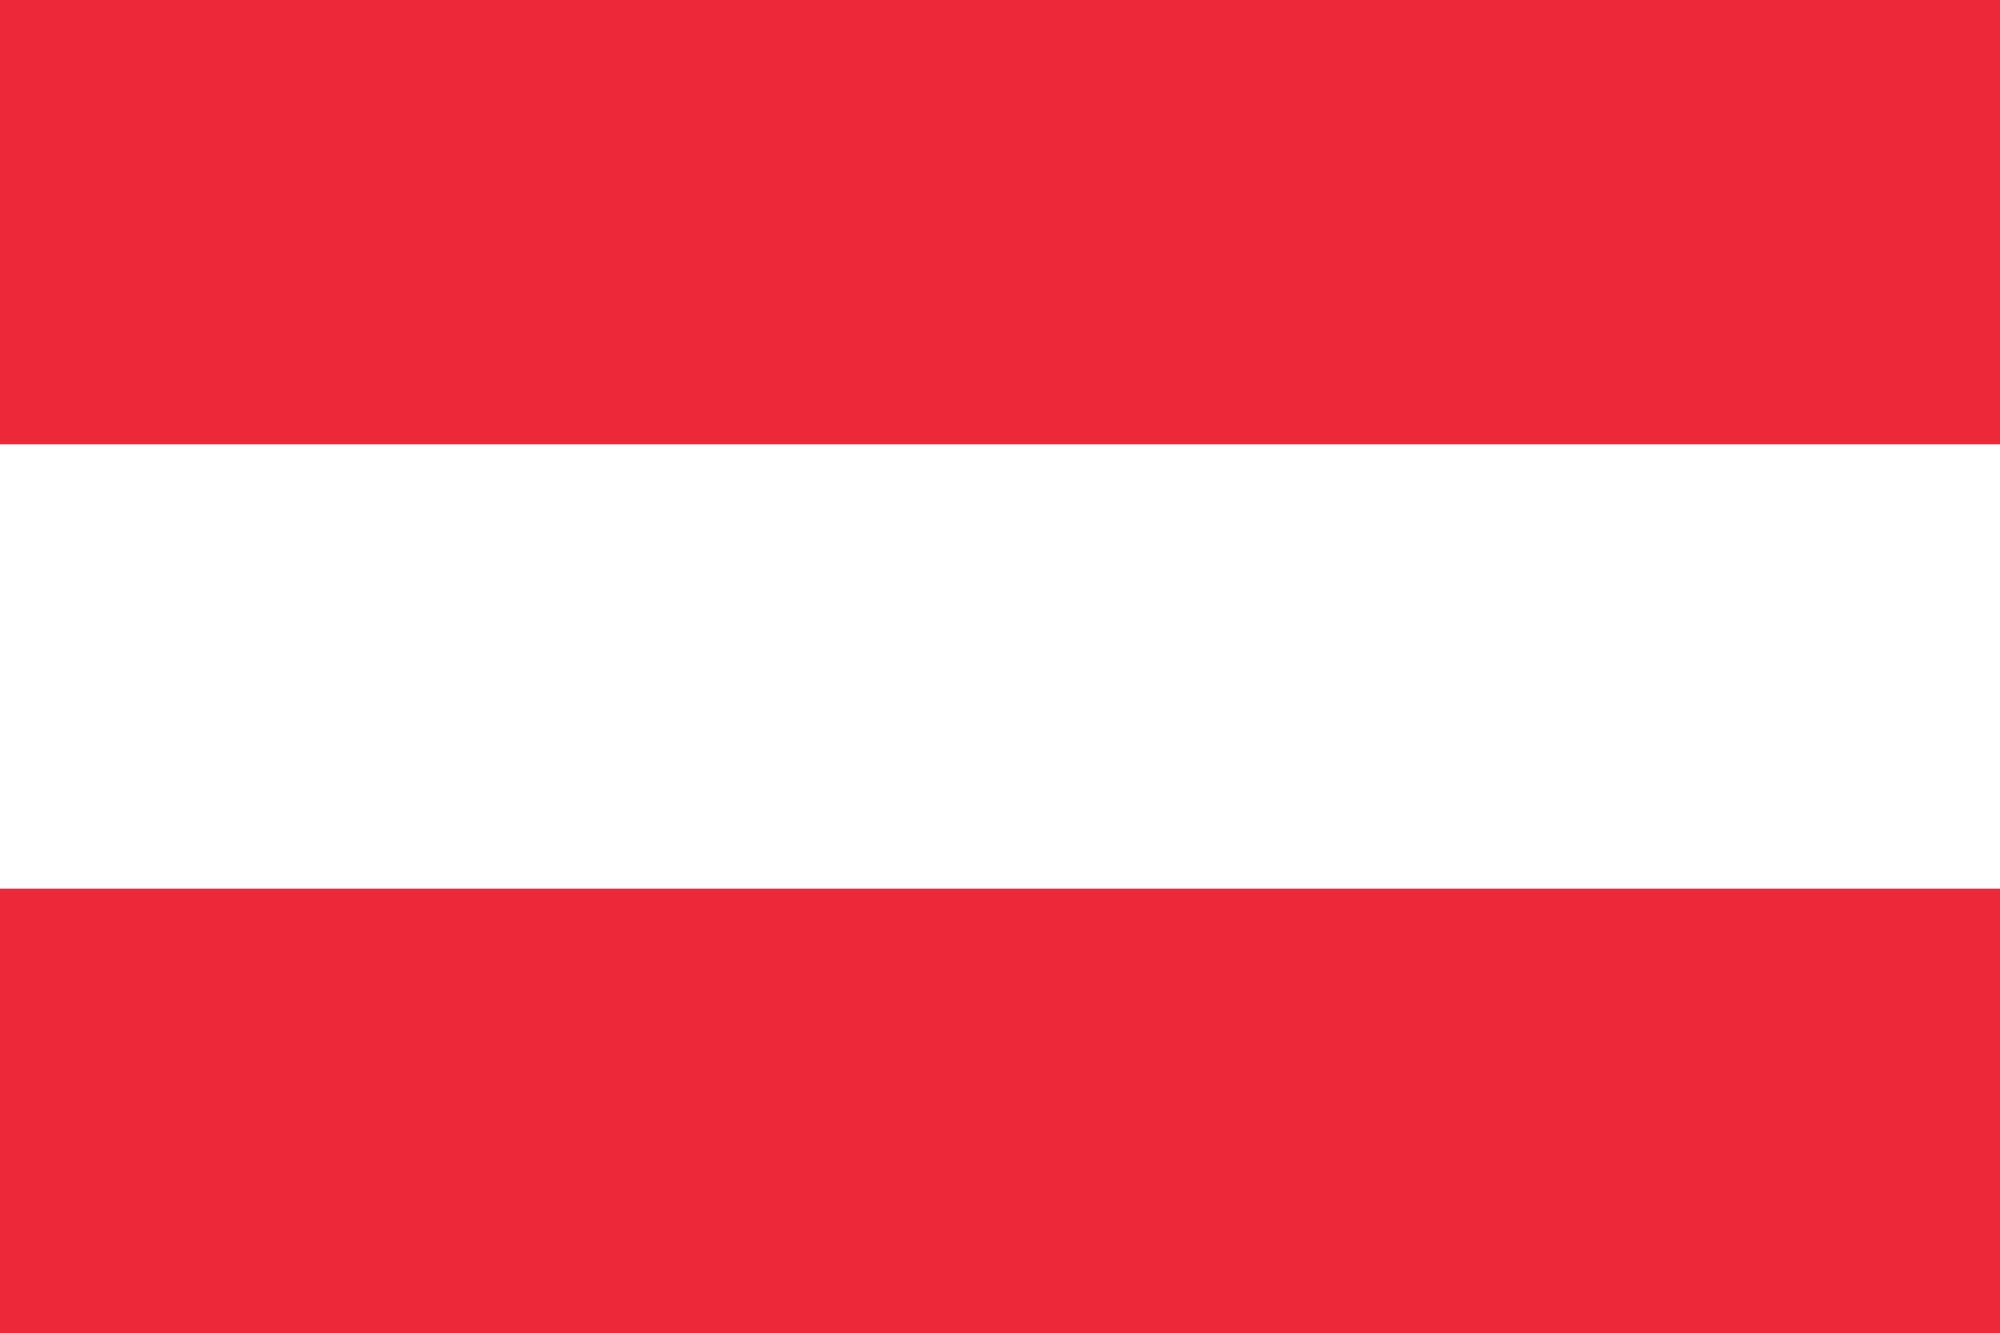 Copy of Austria